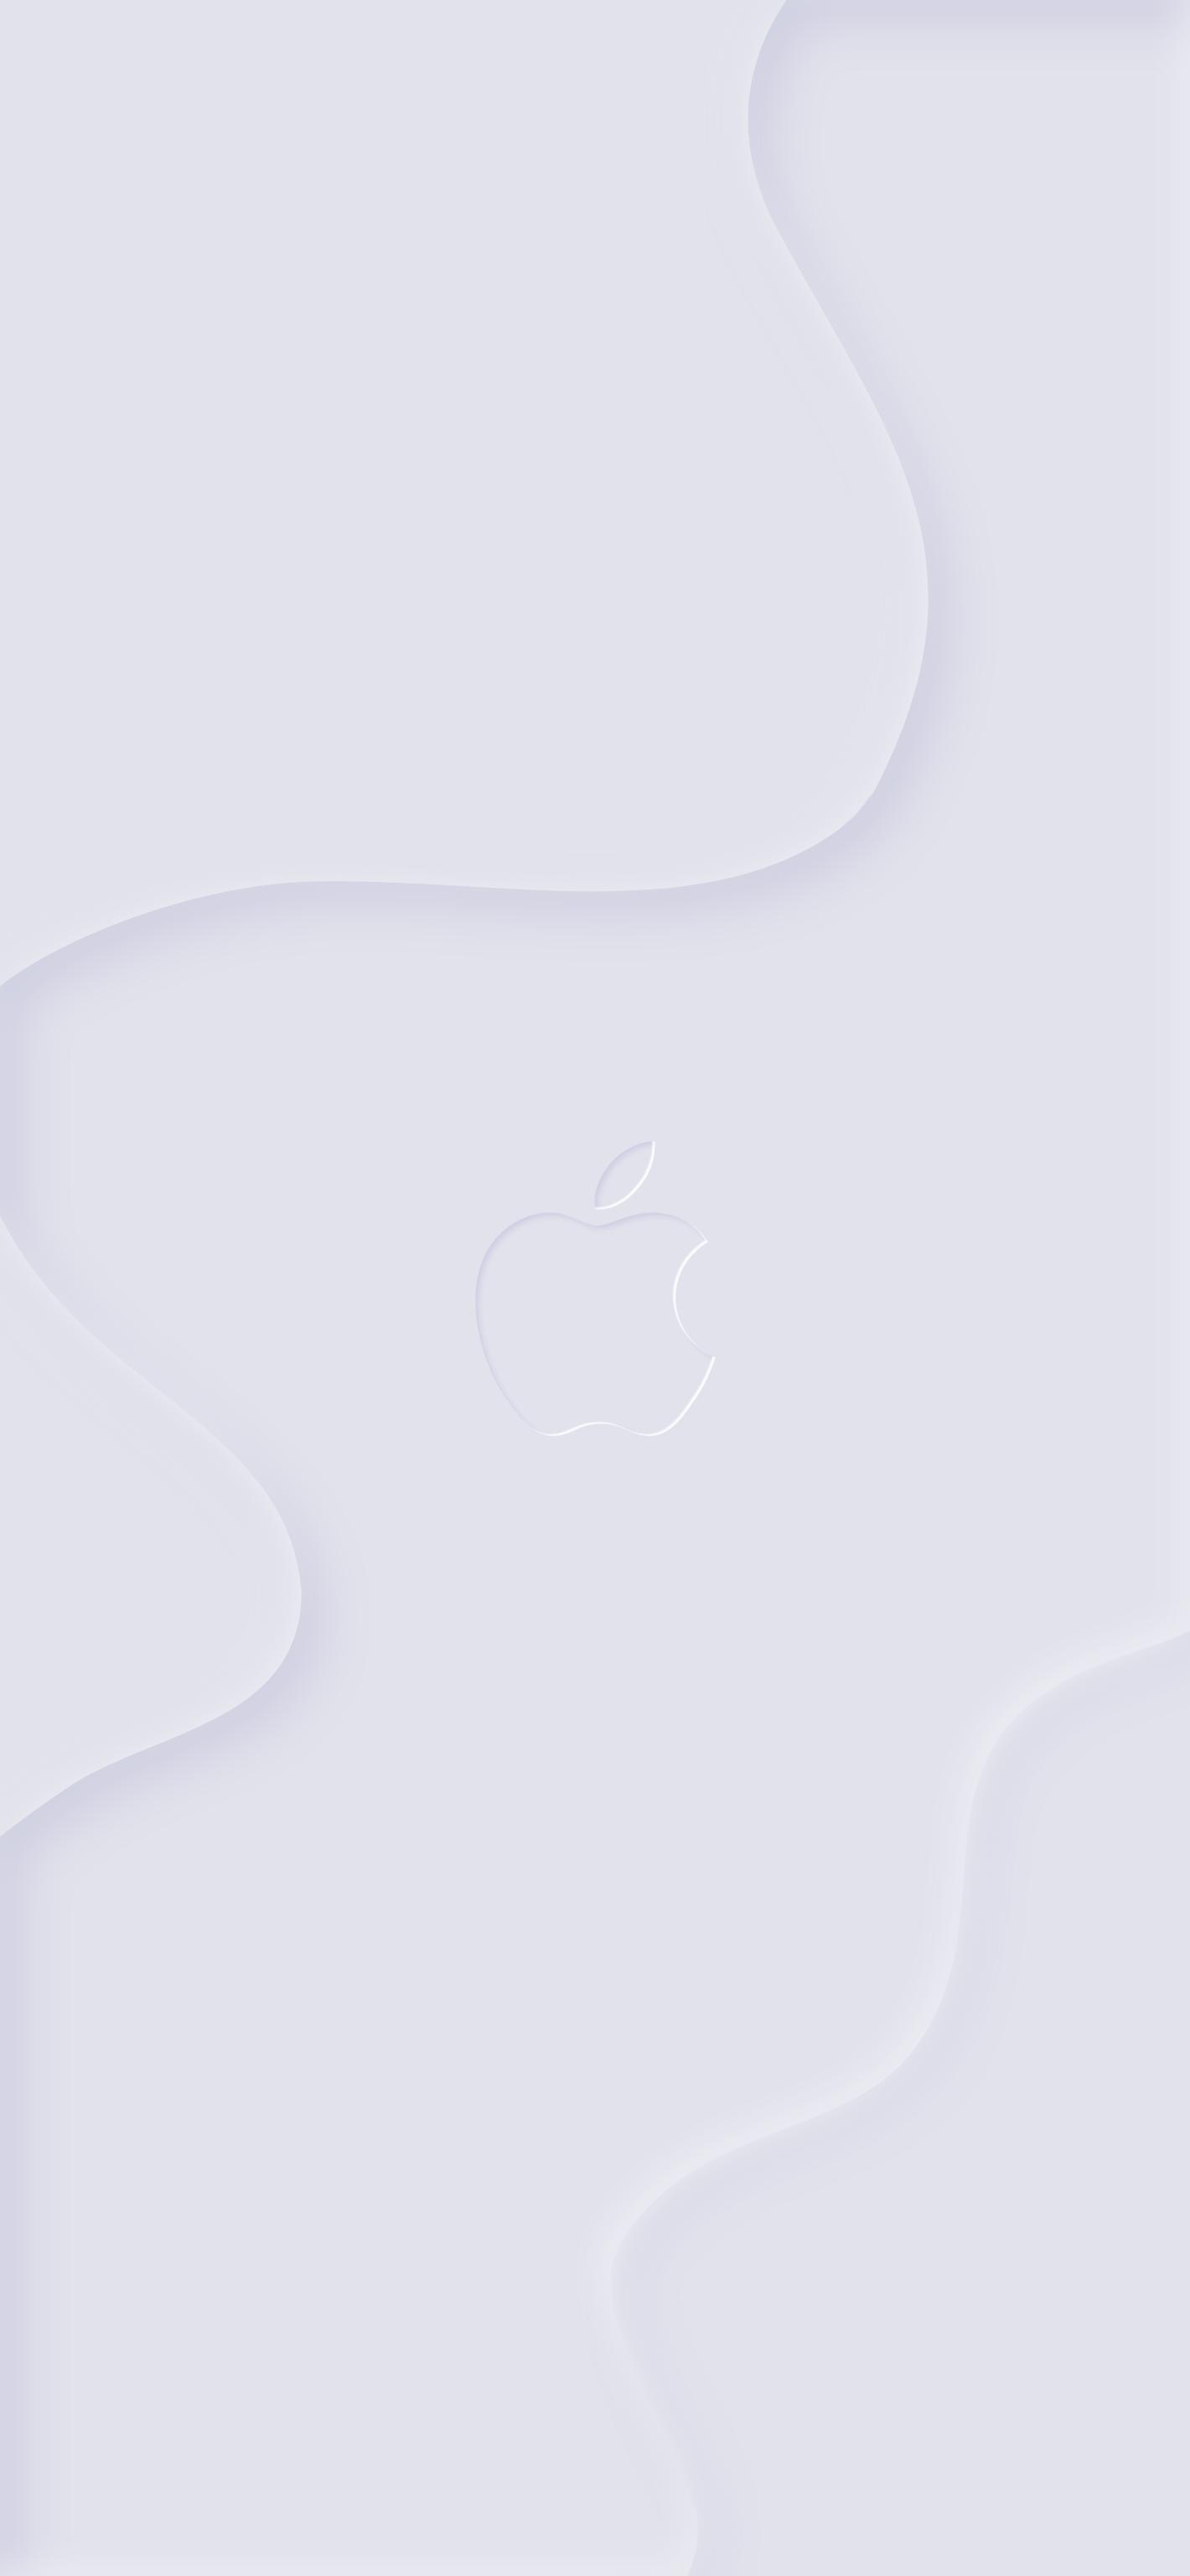 Iphone Trend 2020 Wallpapers Wallpaper Cave